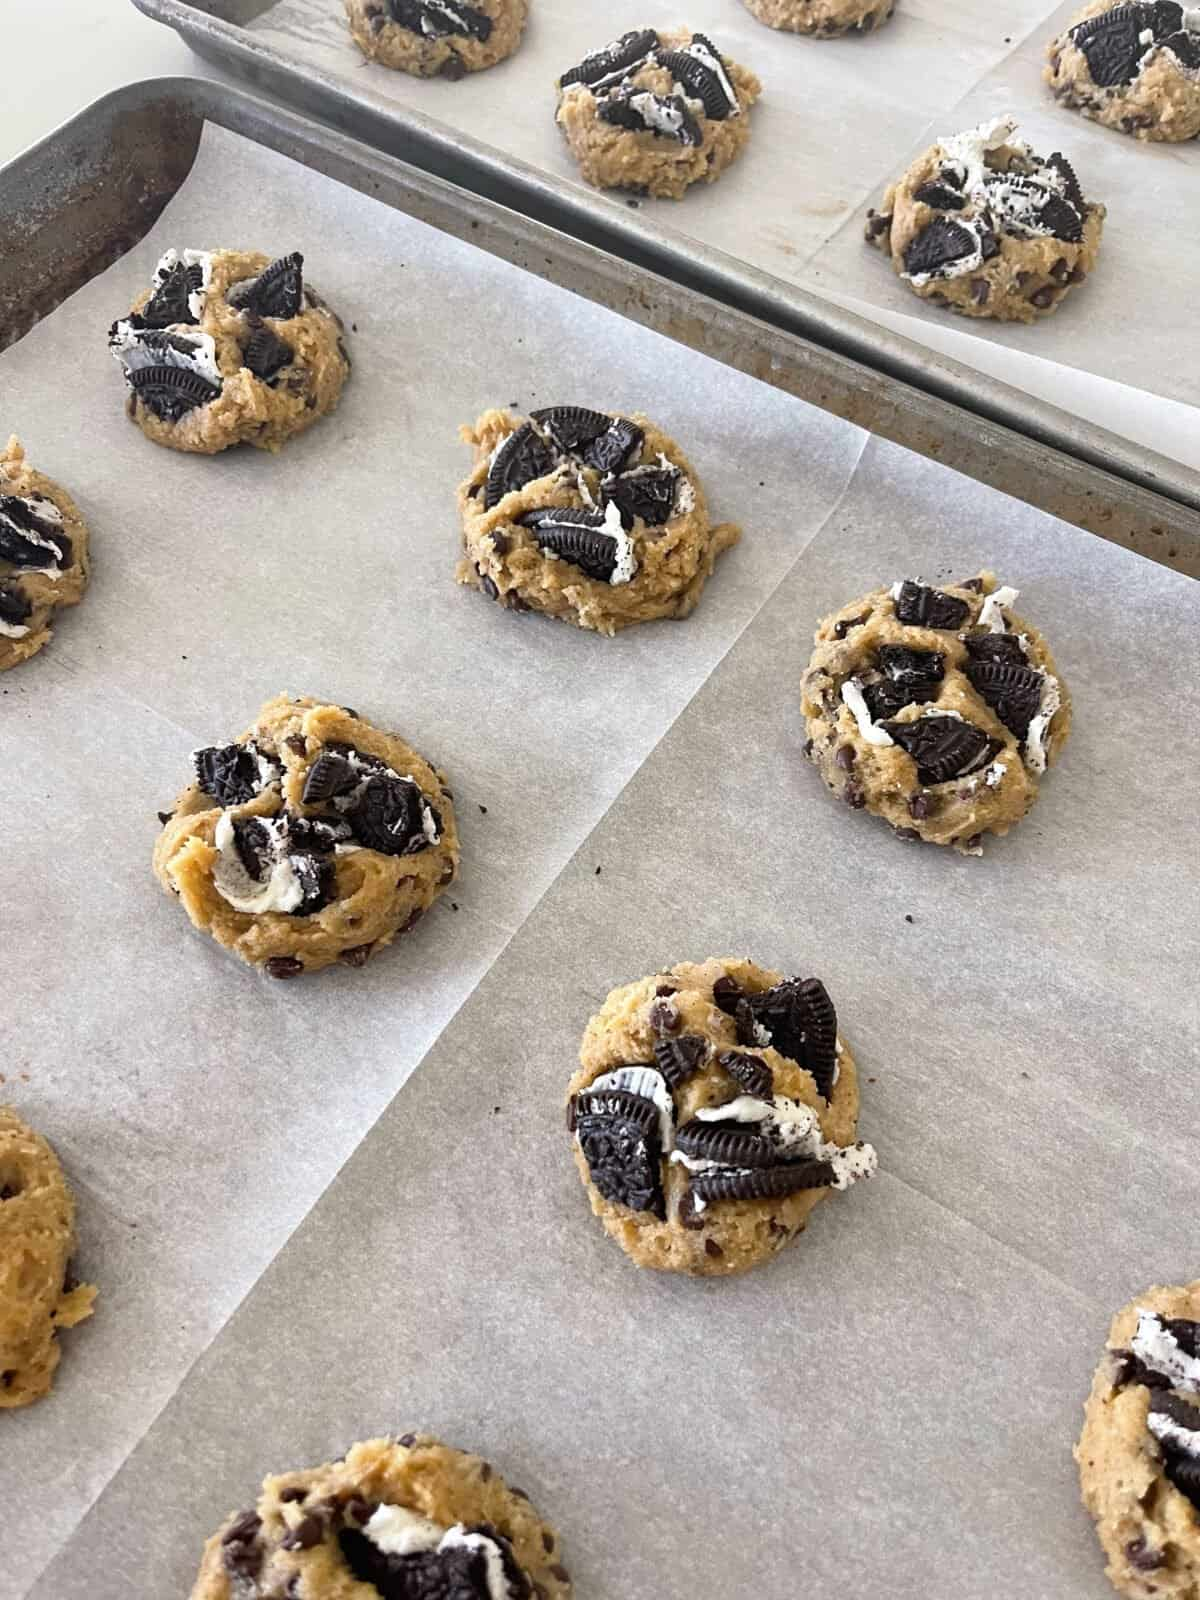 oreo cookie dough on baking sheet